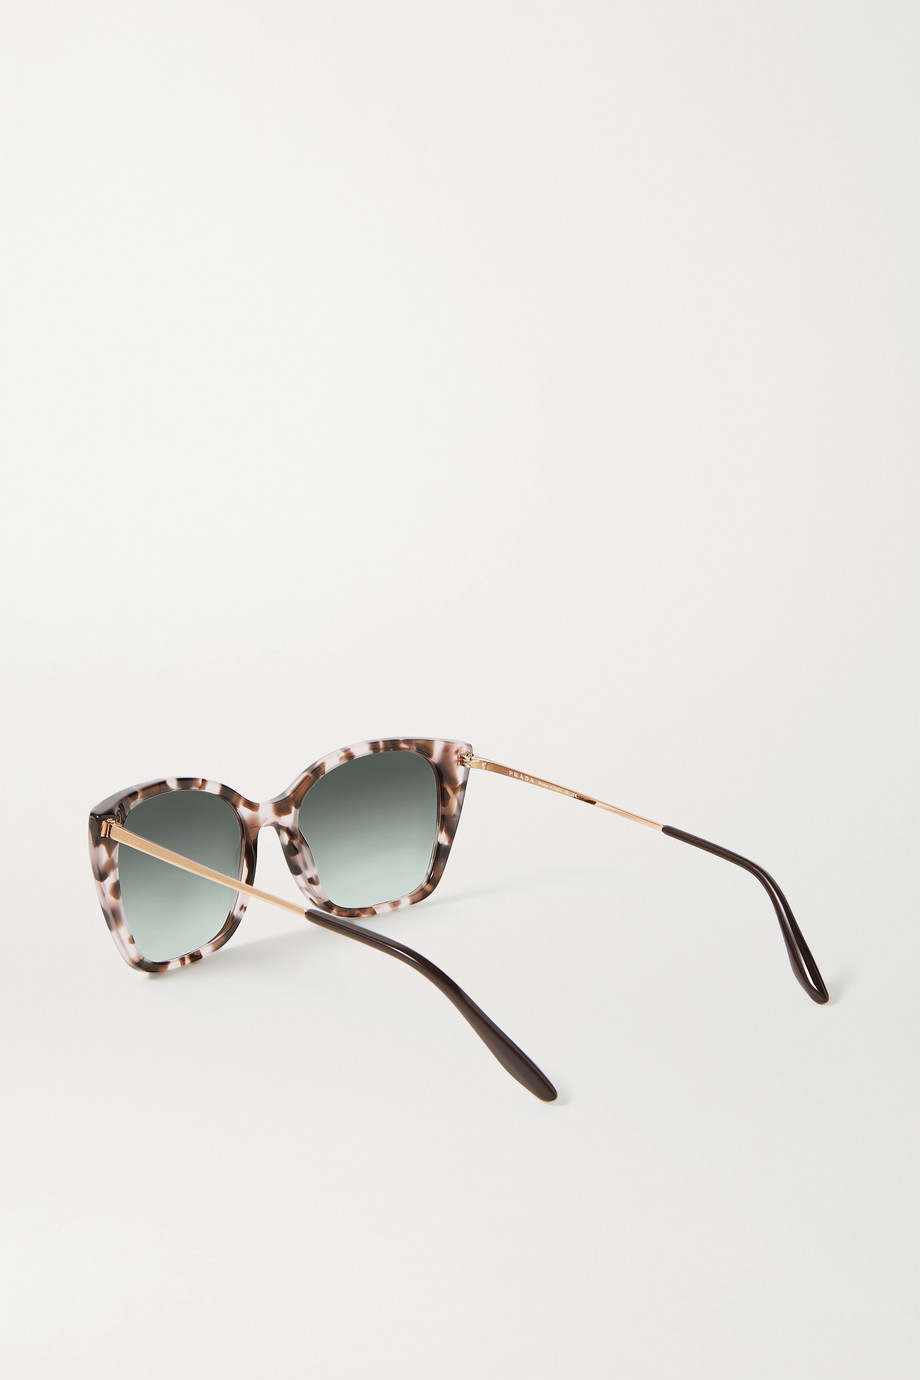 Prada Eyewear Cat-eye tortoiseshell acetate and gold-tone sunglasses